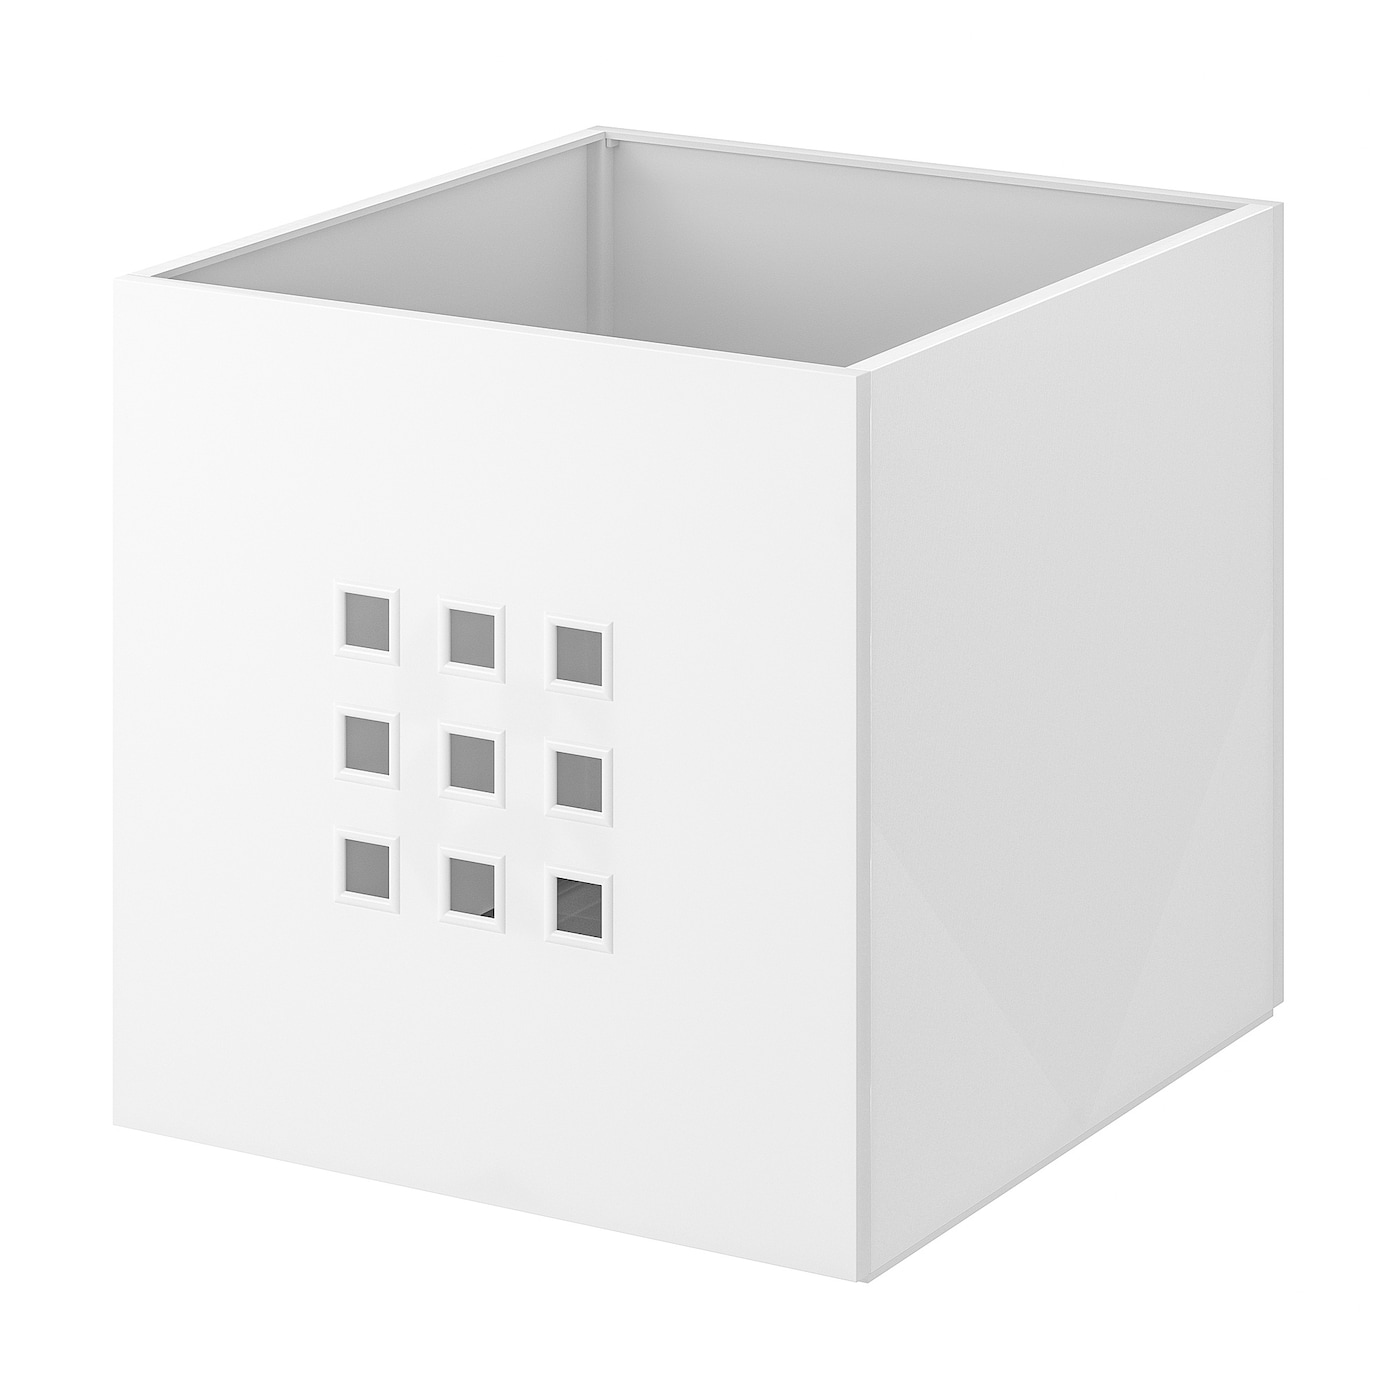 LEKMAN Caja blanco 33x37x33 cm